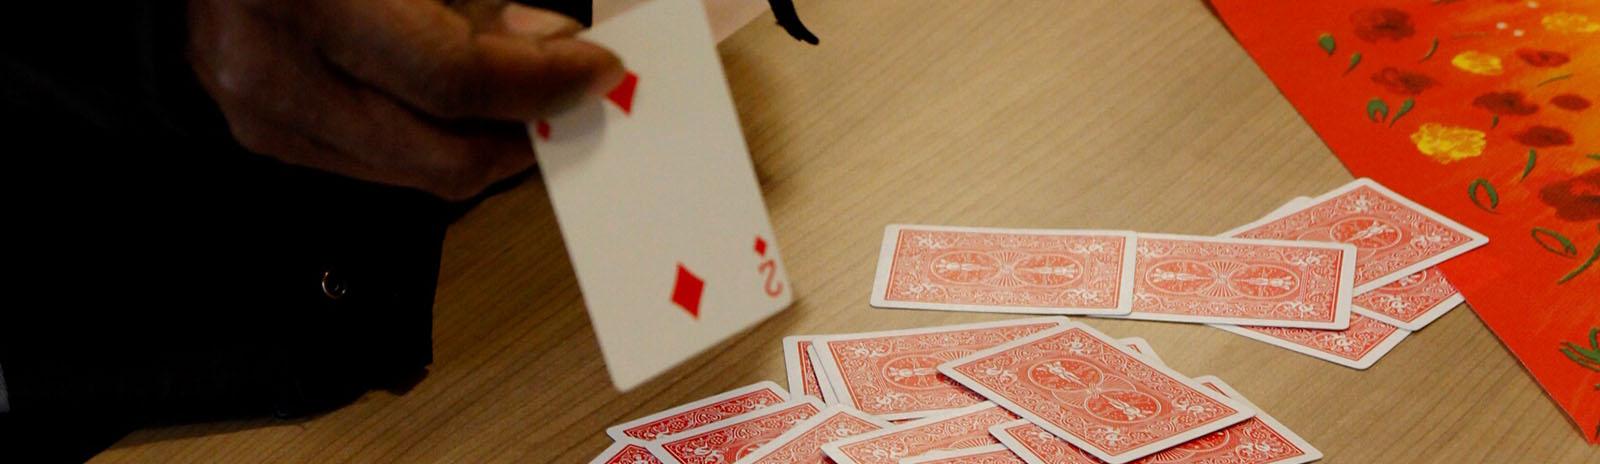 2019_08_17_Glantal_Poker_slider